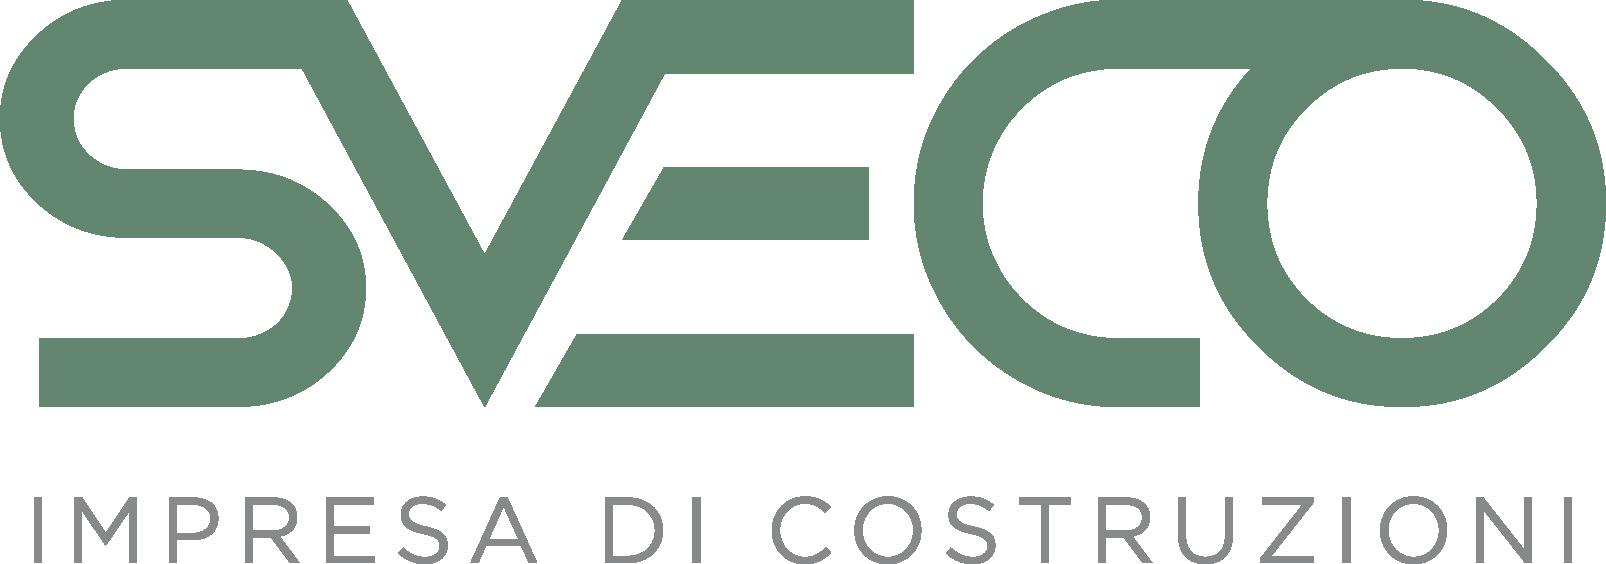 Sveco Spa Logo